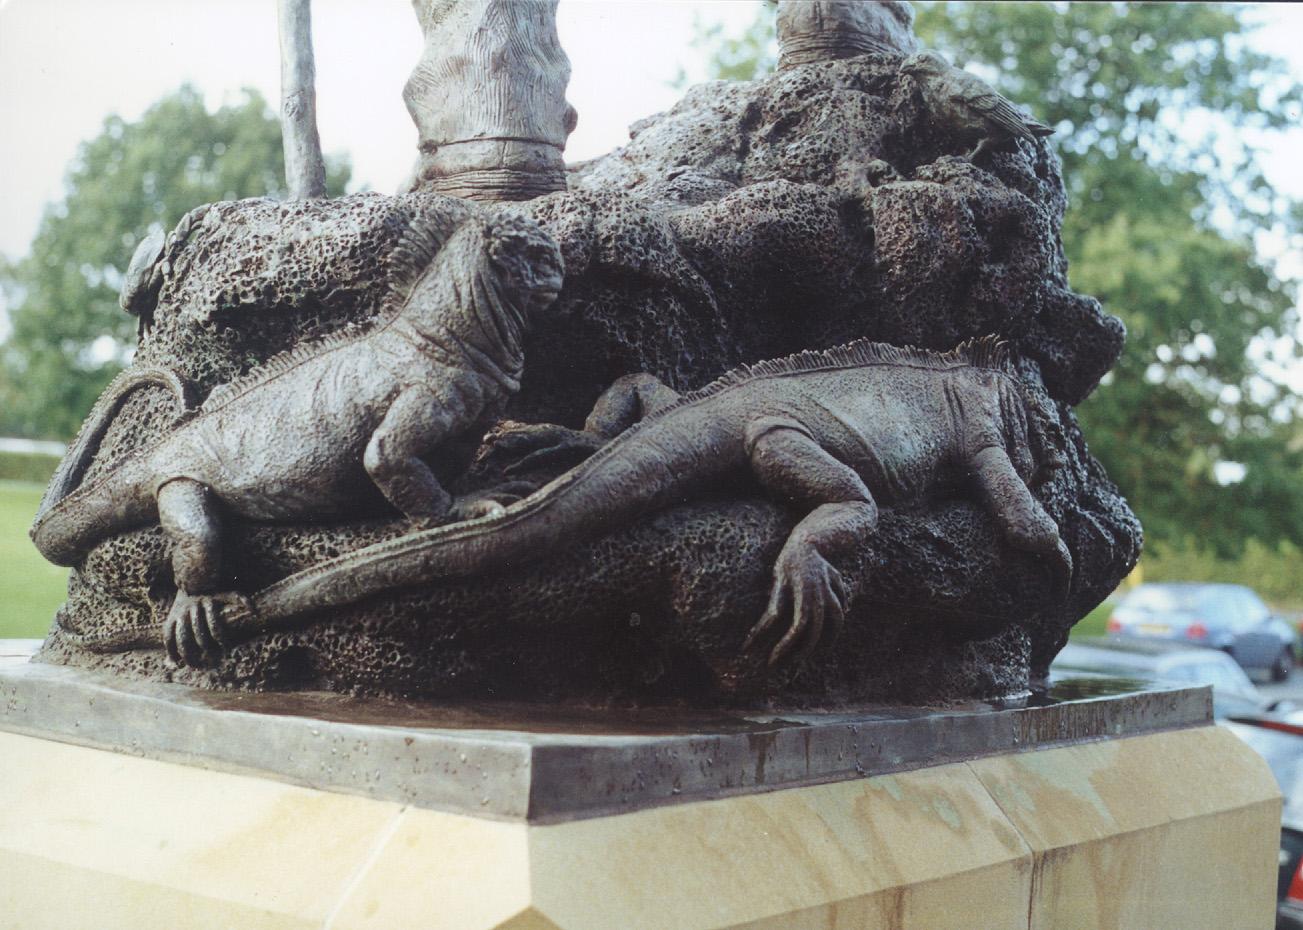 marine-iguanas-at-darwins-feet.jpg